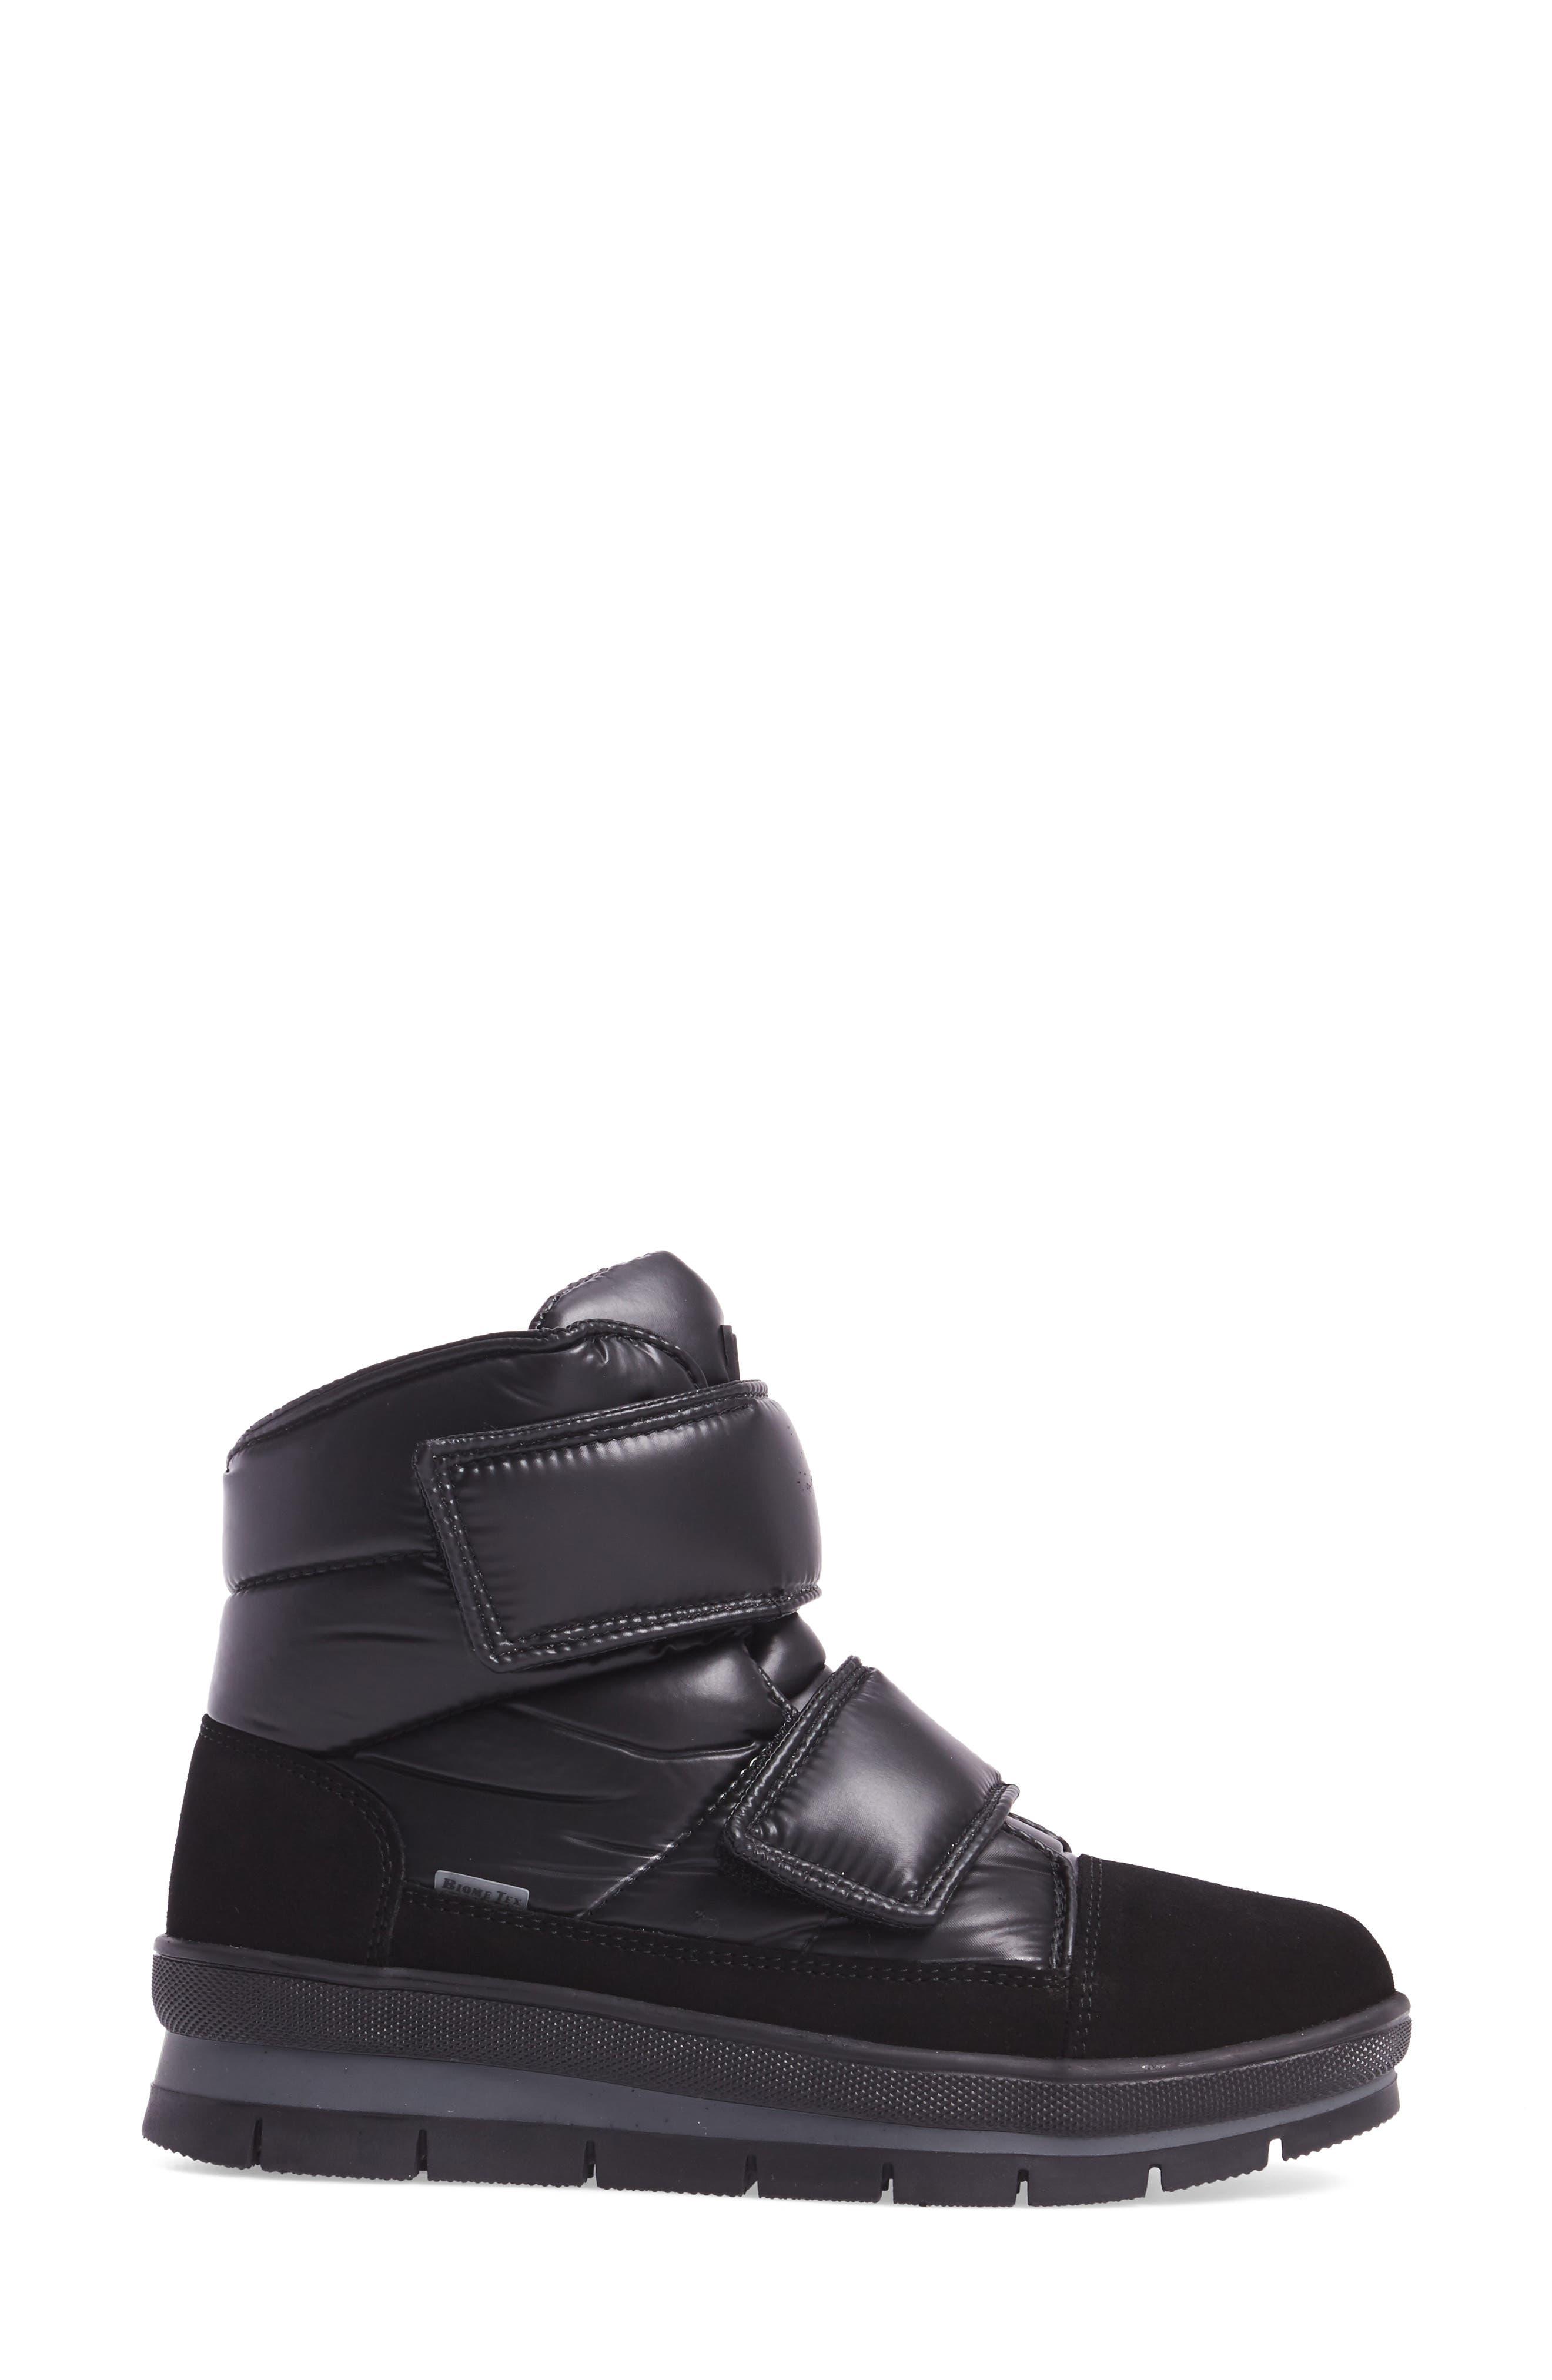 Gran Sasso Waterproof Boot,                             Alternate thumbnail 3, color,                             Black Baltico